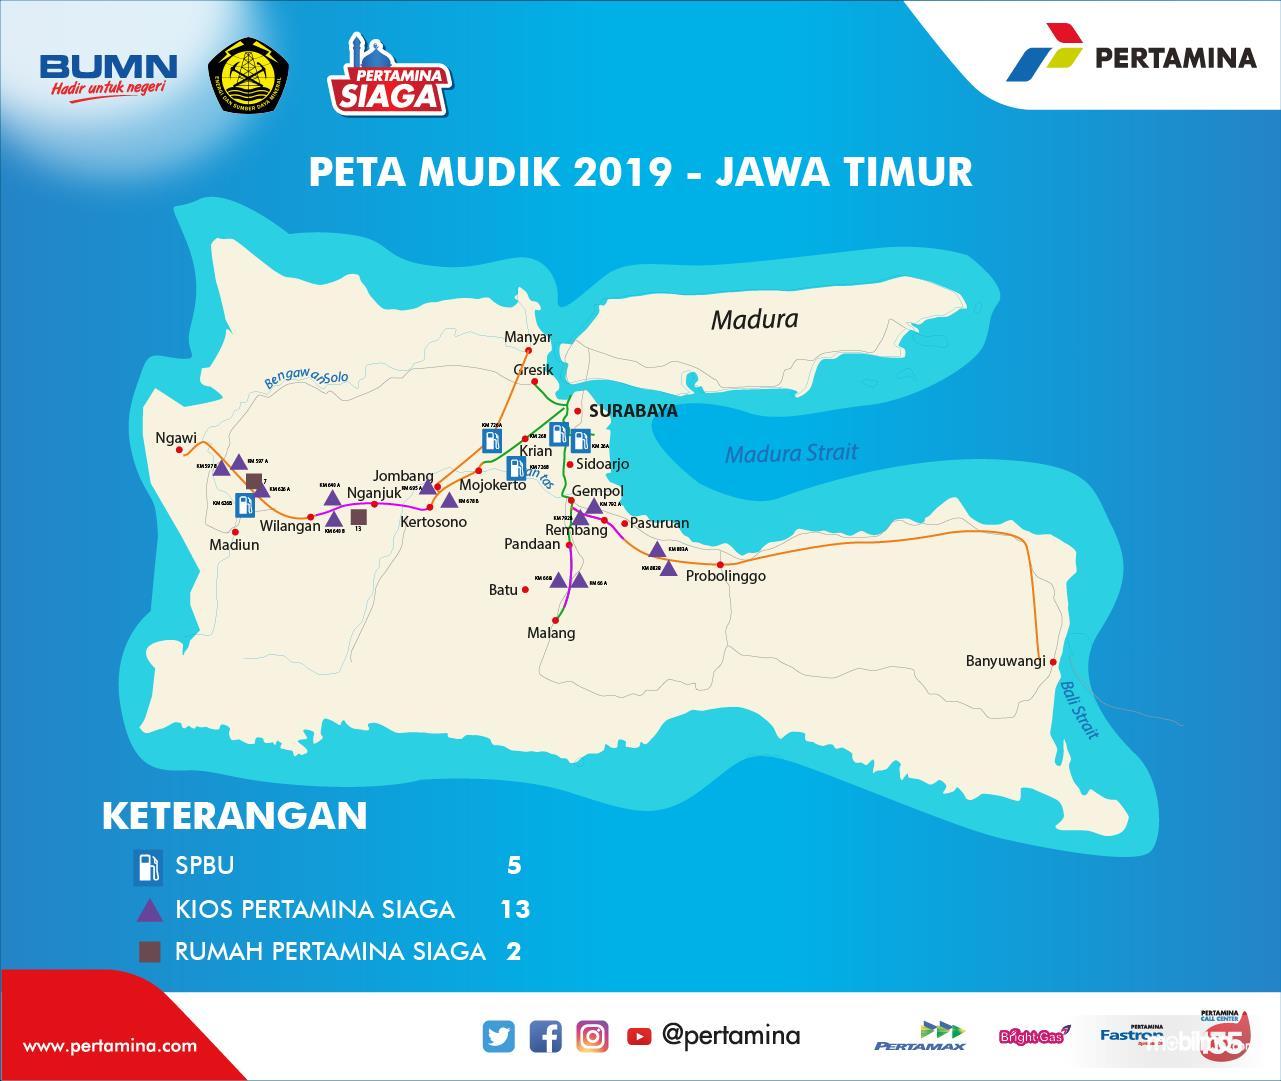 Peta Pertamina Siaga wilayah Provinsi Jawa Timur